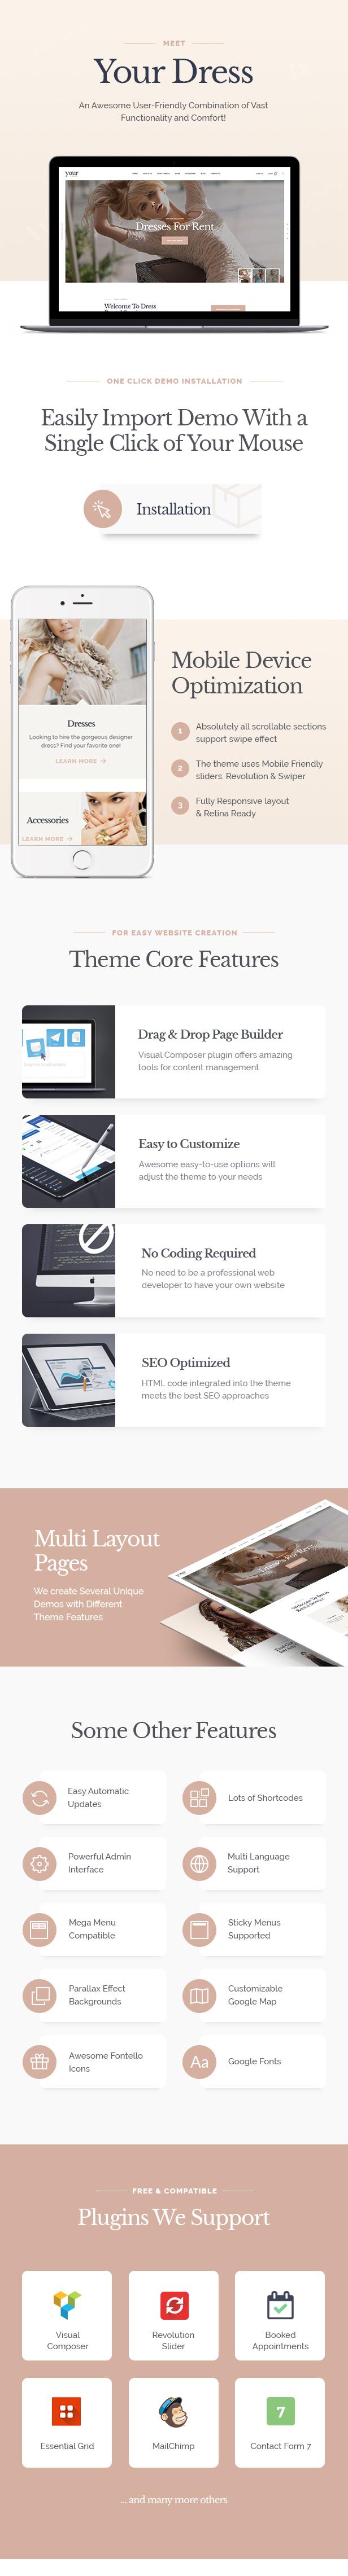 Your Dress | Dress Rent Rental Services WordPress Theme - 1